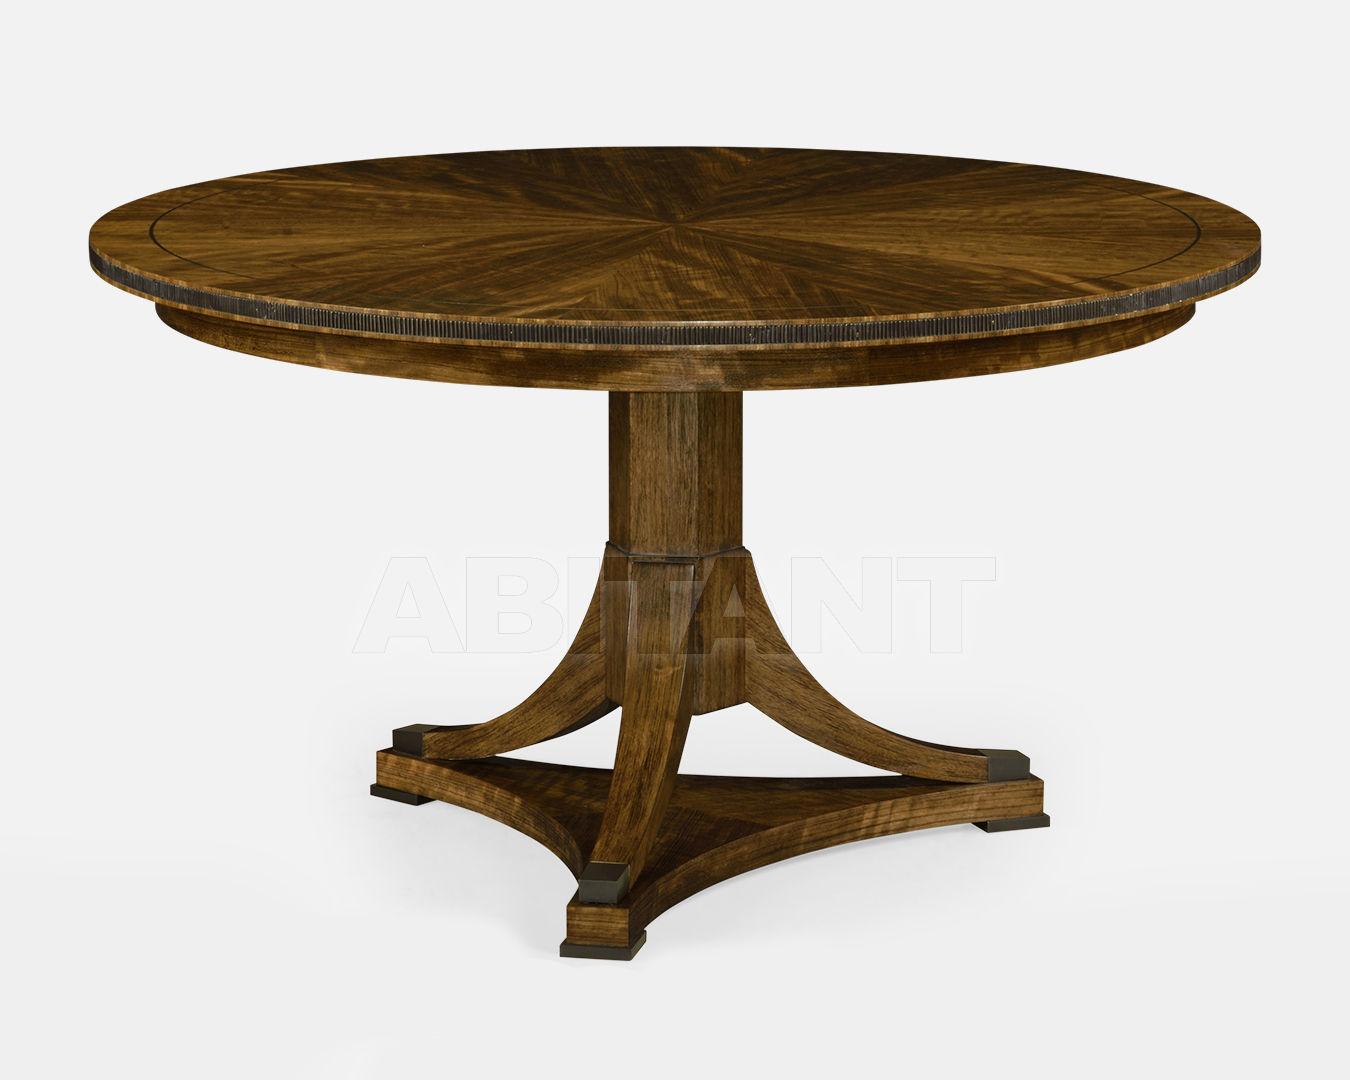 Купить Стол обеденный Jonathan Charles Fine Furniture JC Edited - Cambridge Collection 495857-54D-DBW